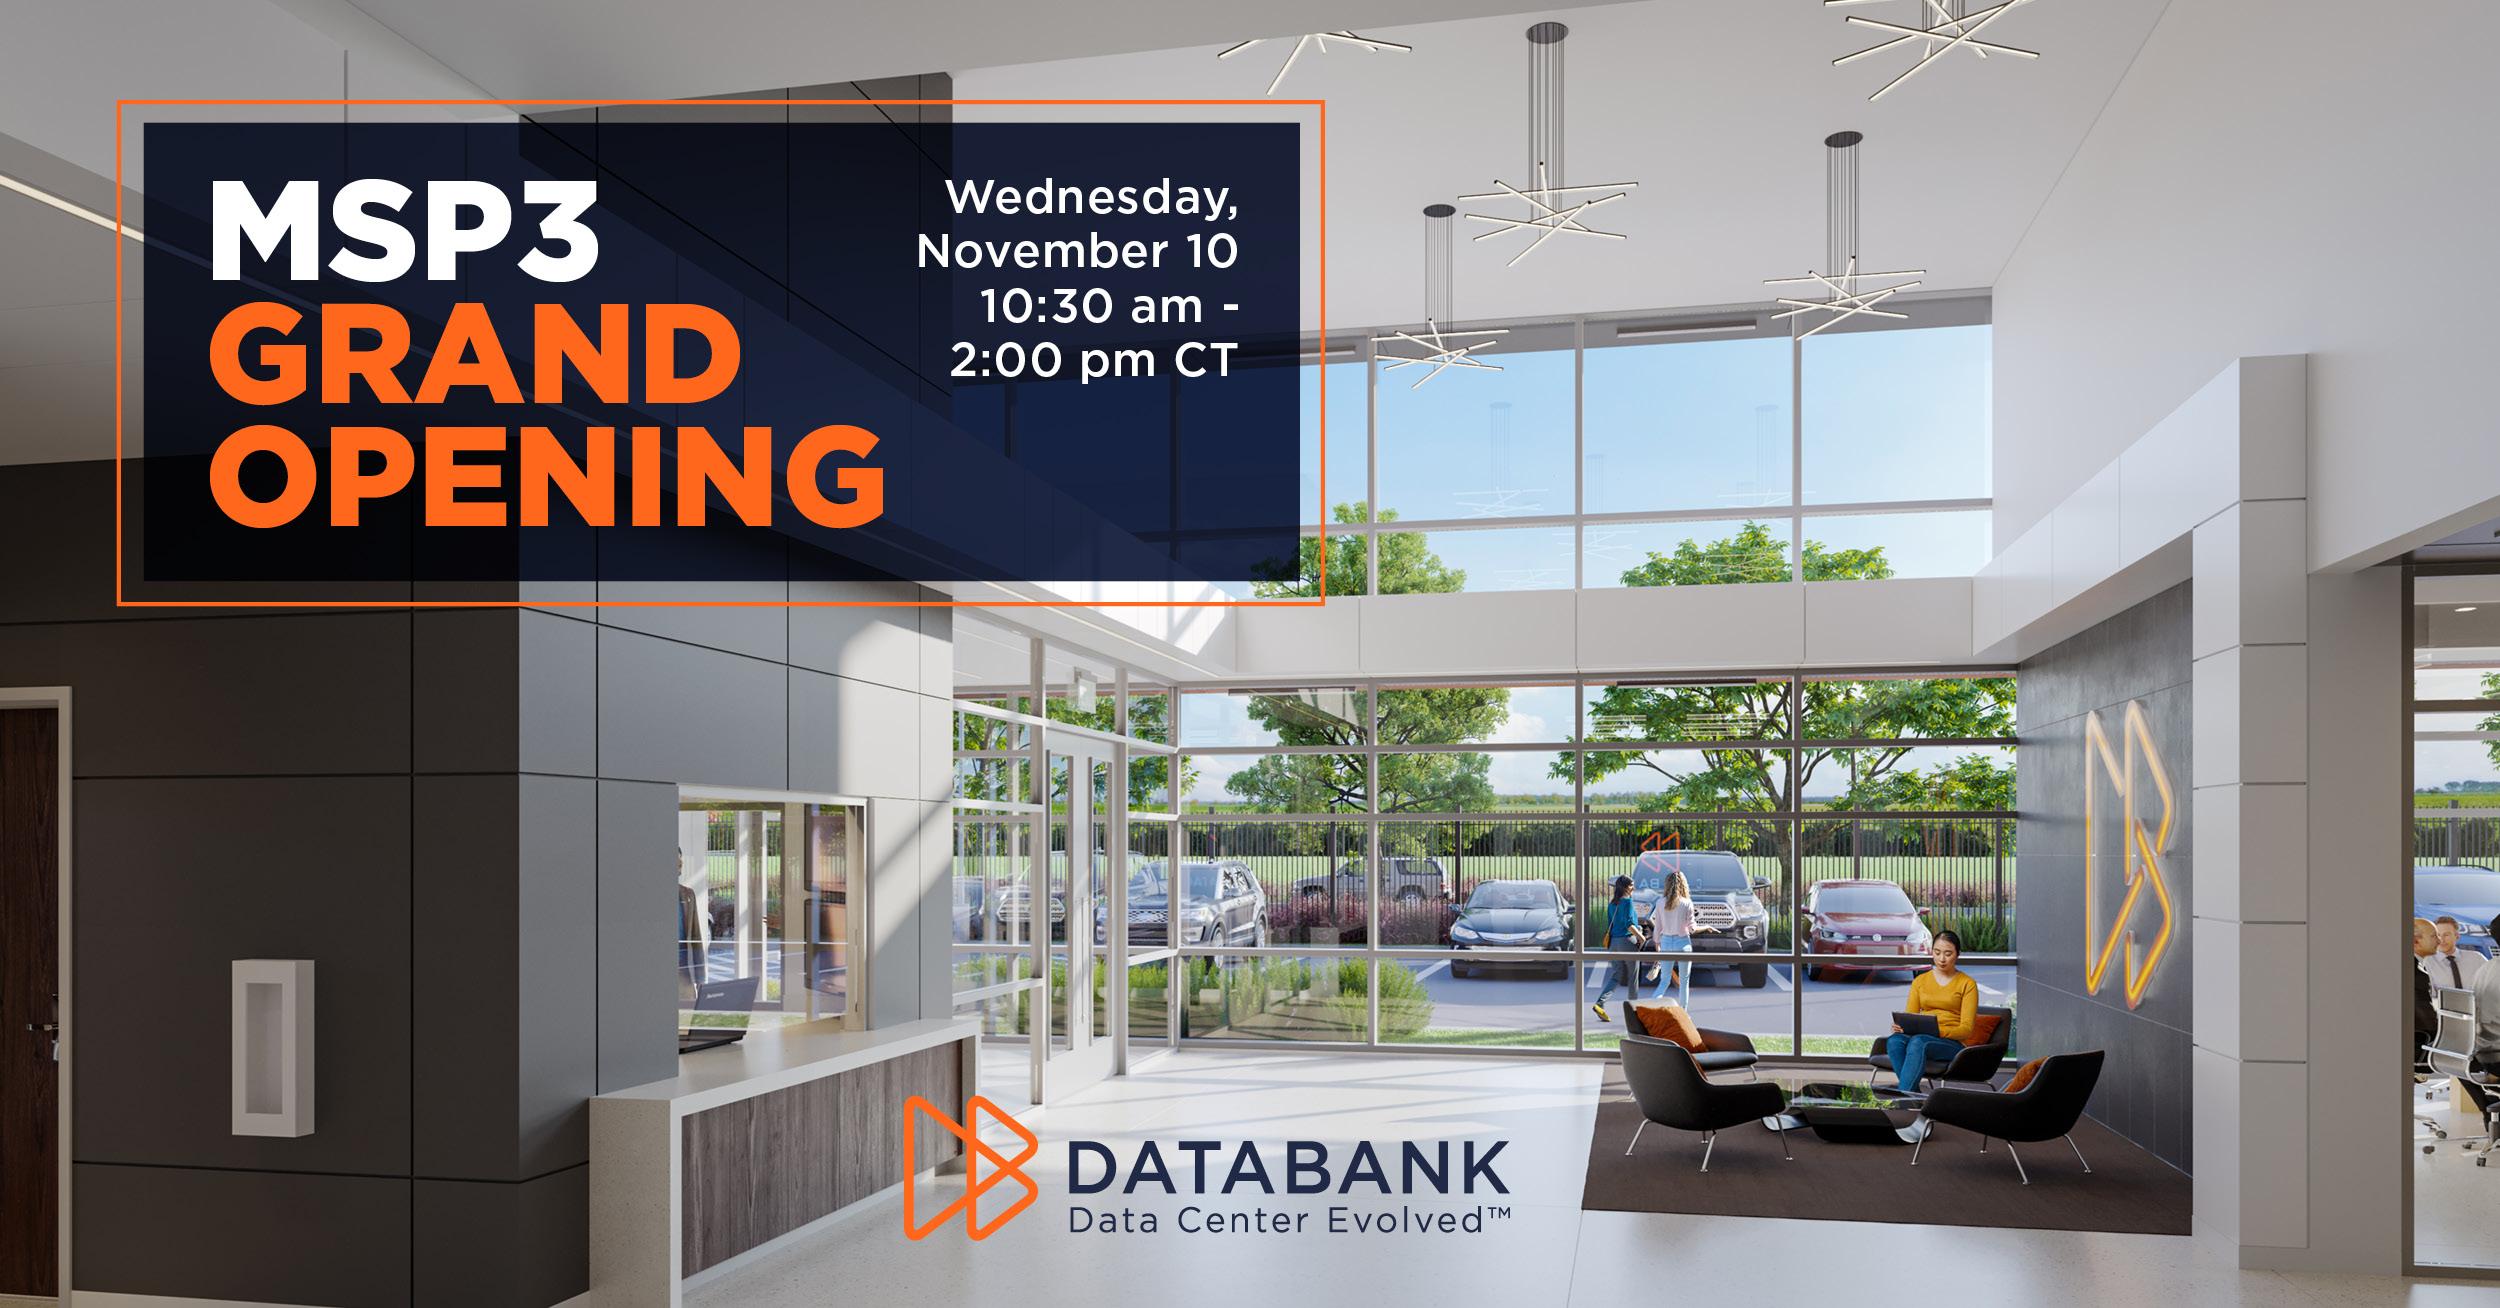 DataBank's Minneapolis (MSP3) Grand Opening